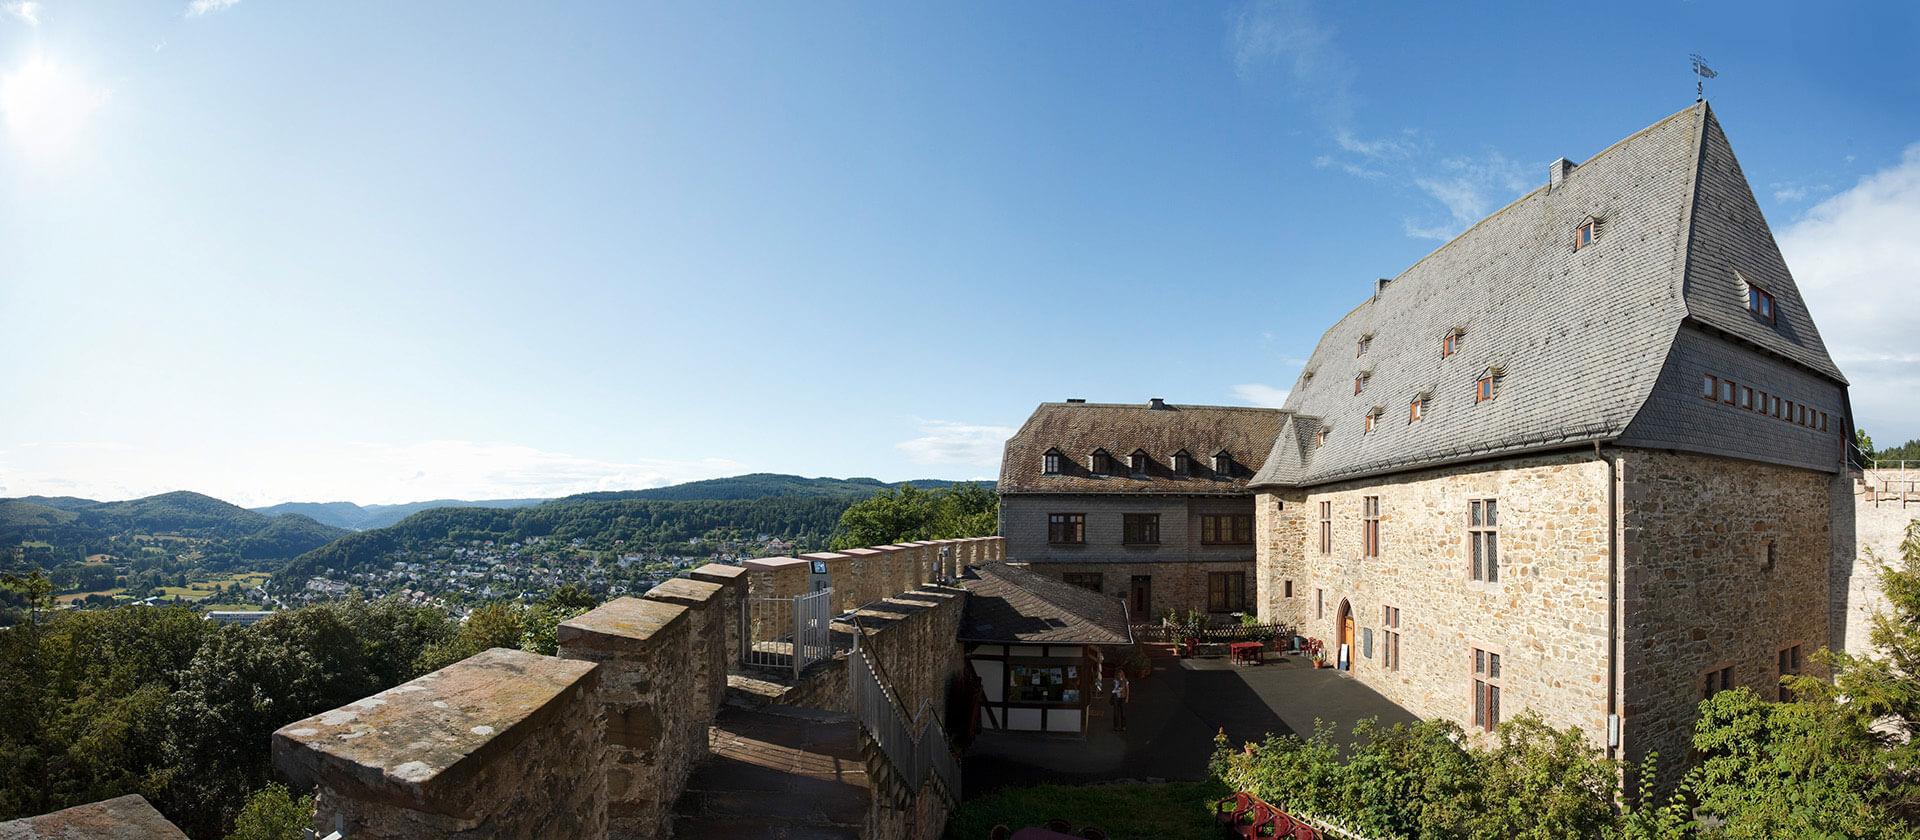 Landgrafenschloss Biedenkopf, Fotocredits Jutta Veit